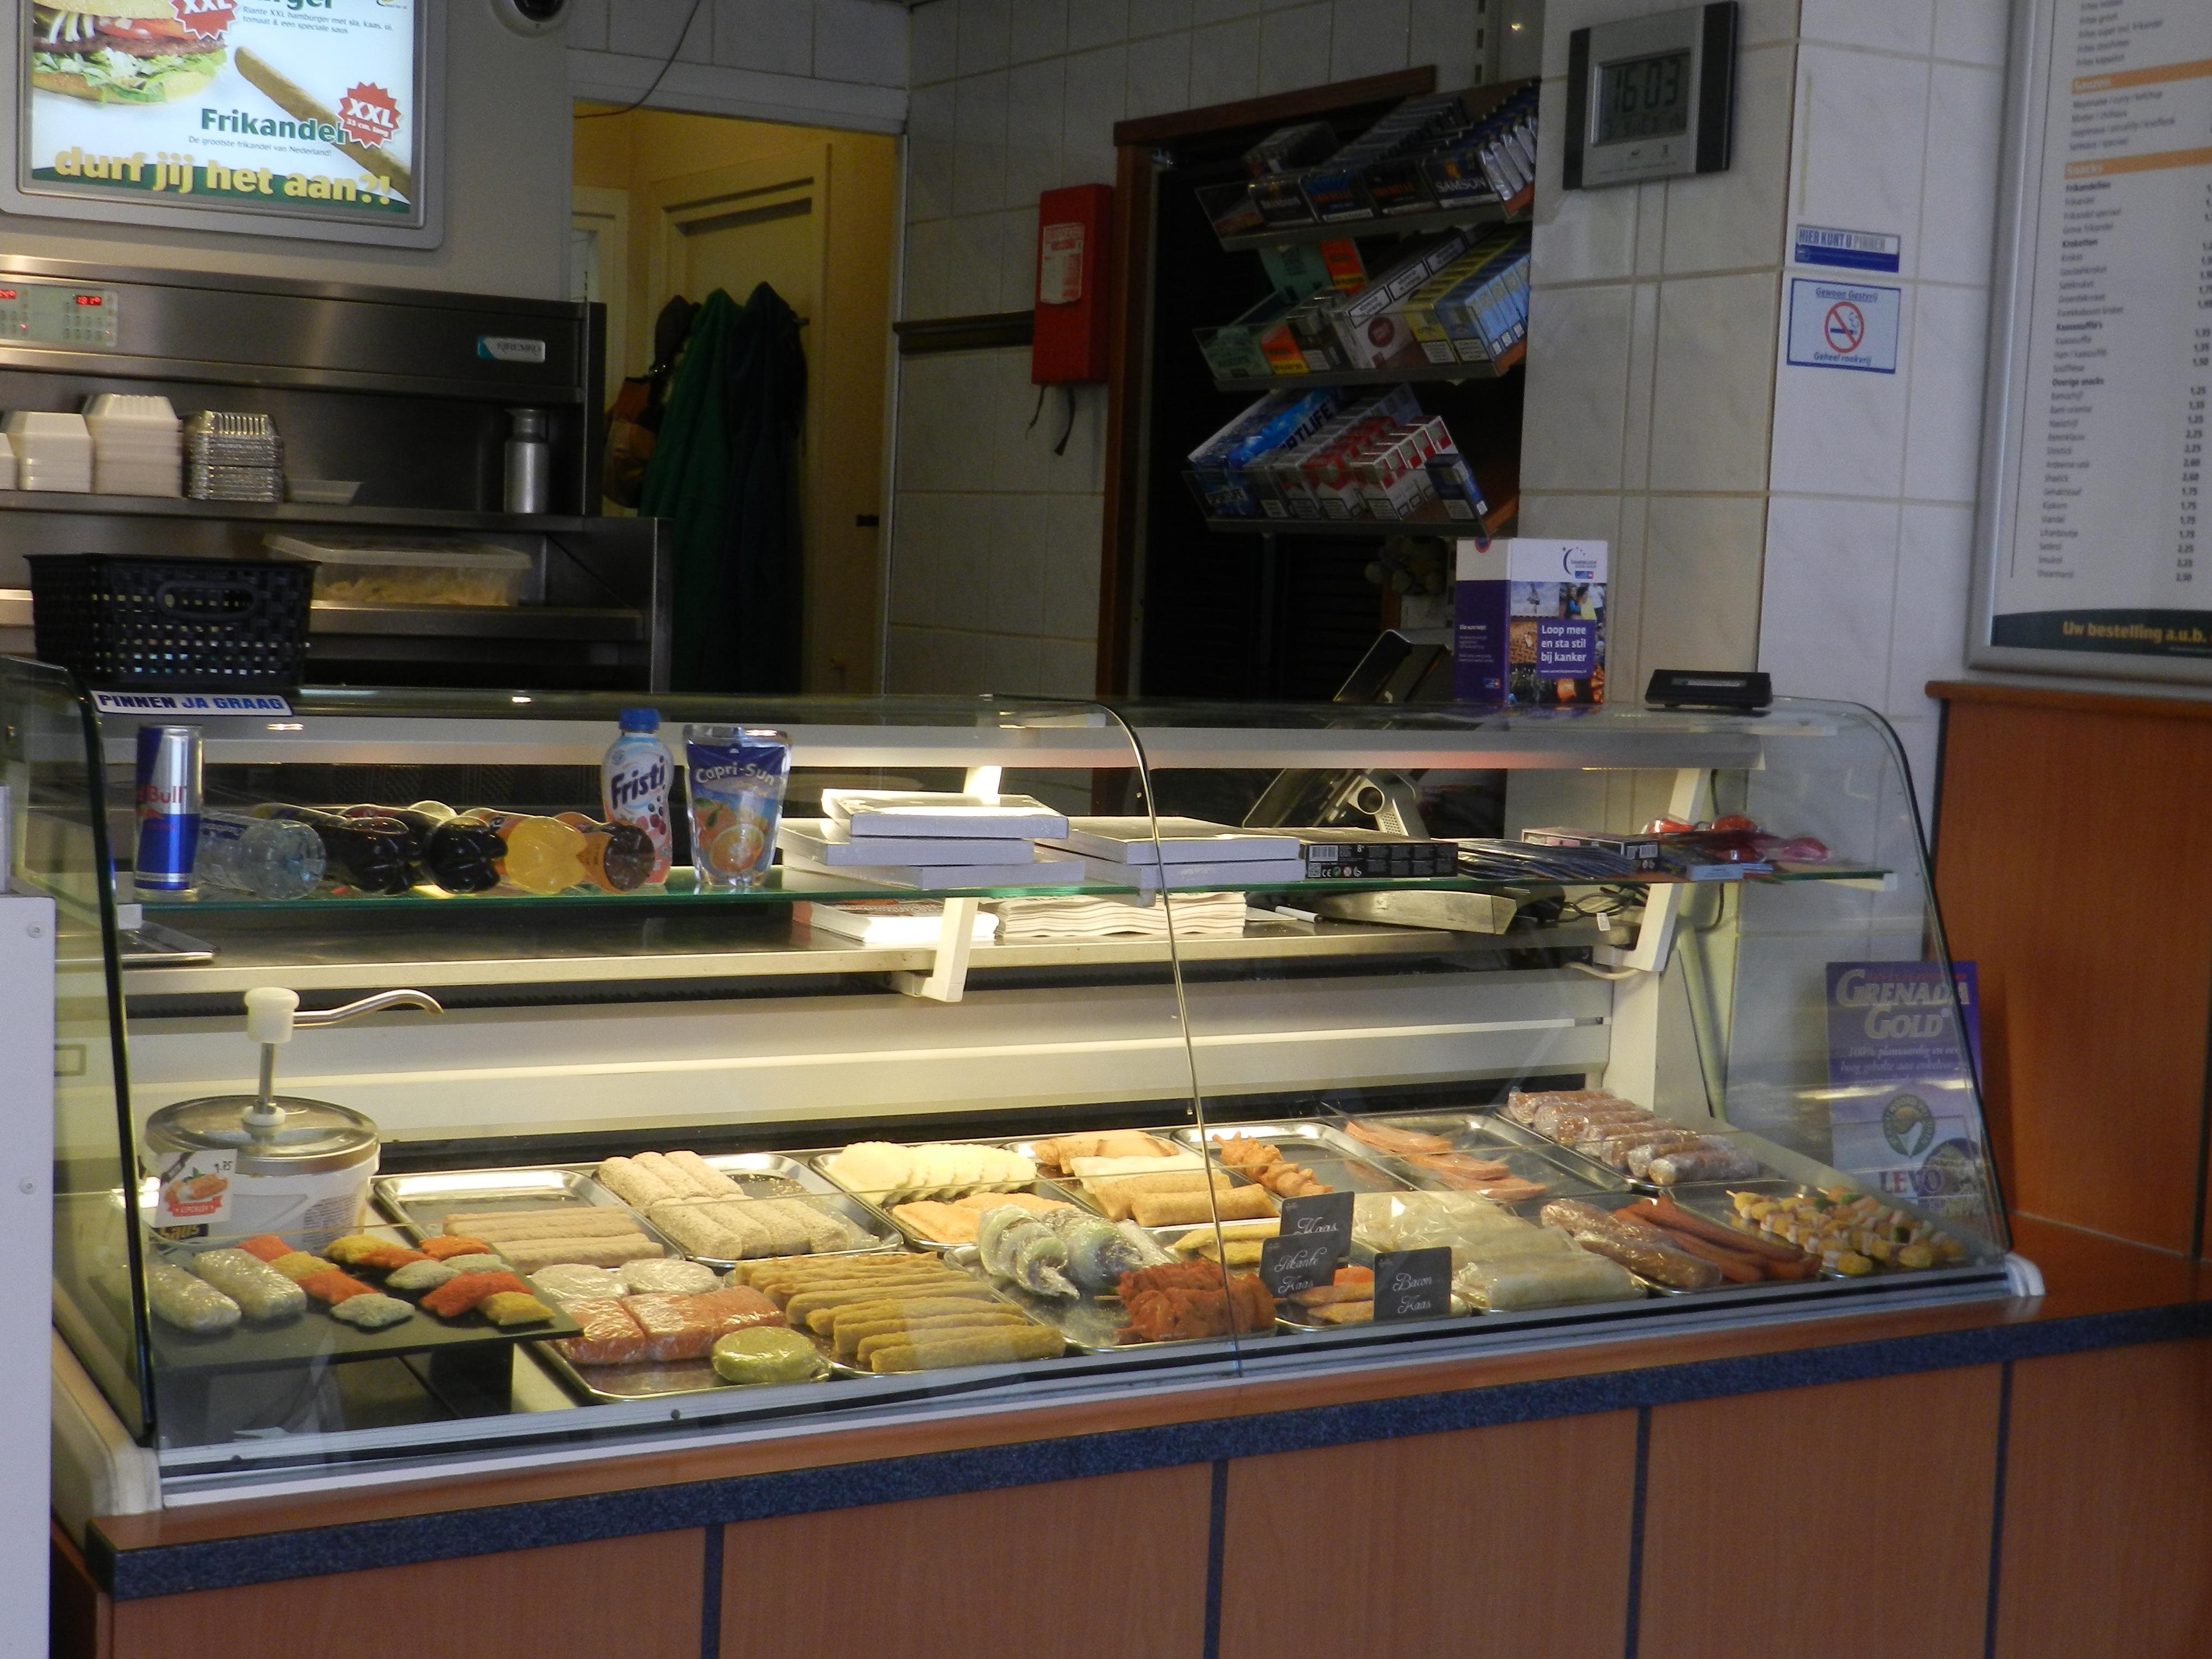 plaza de alm cafetaria almkerk Over ons